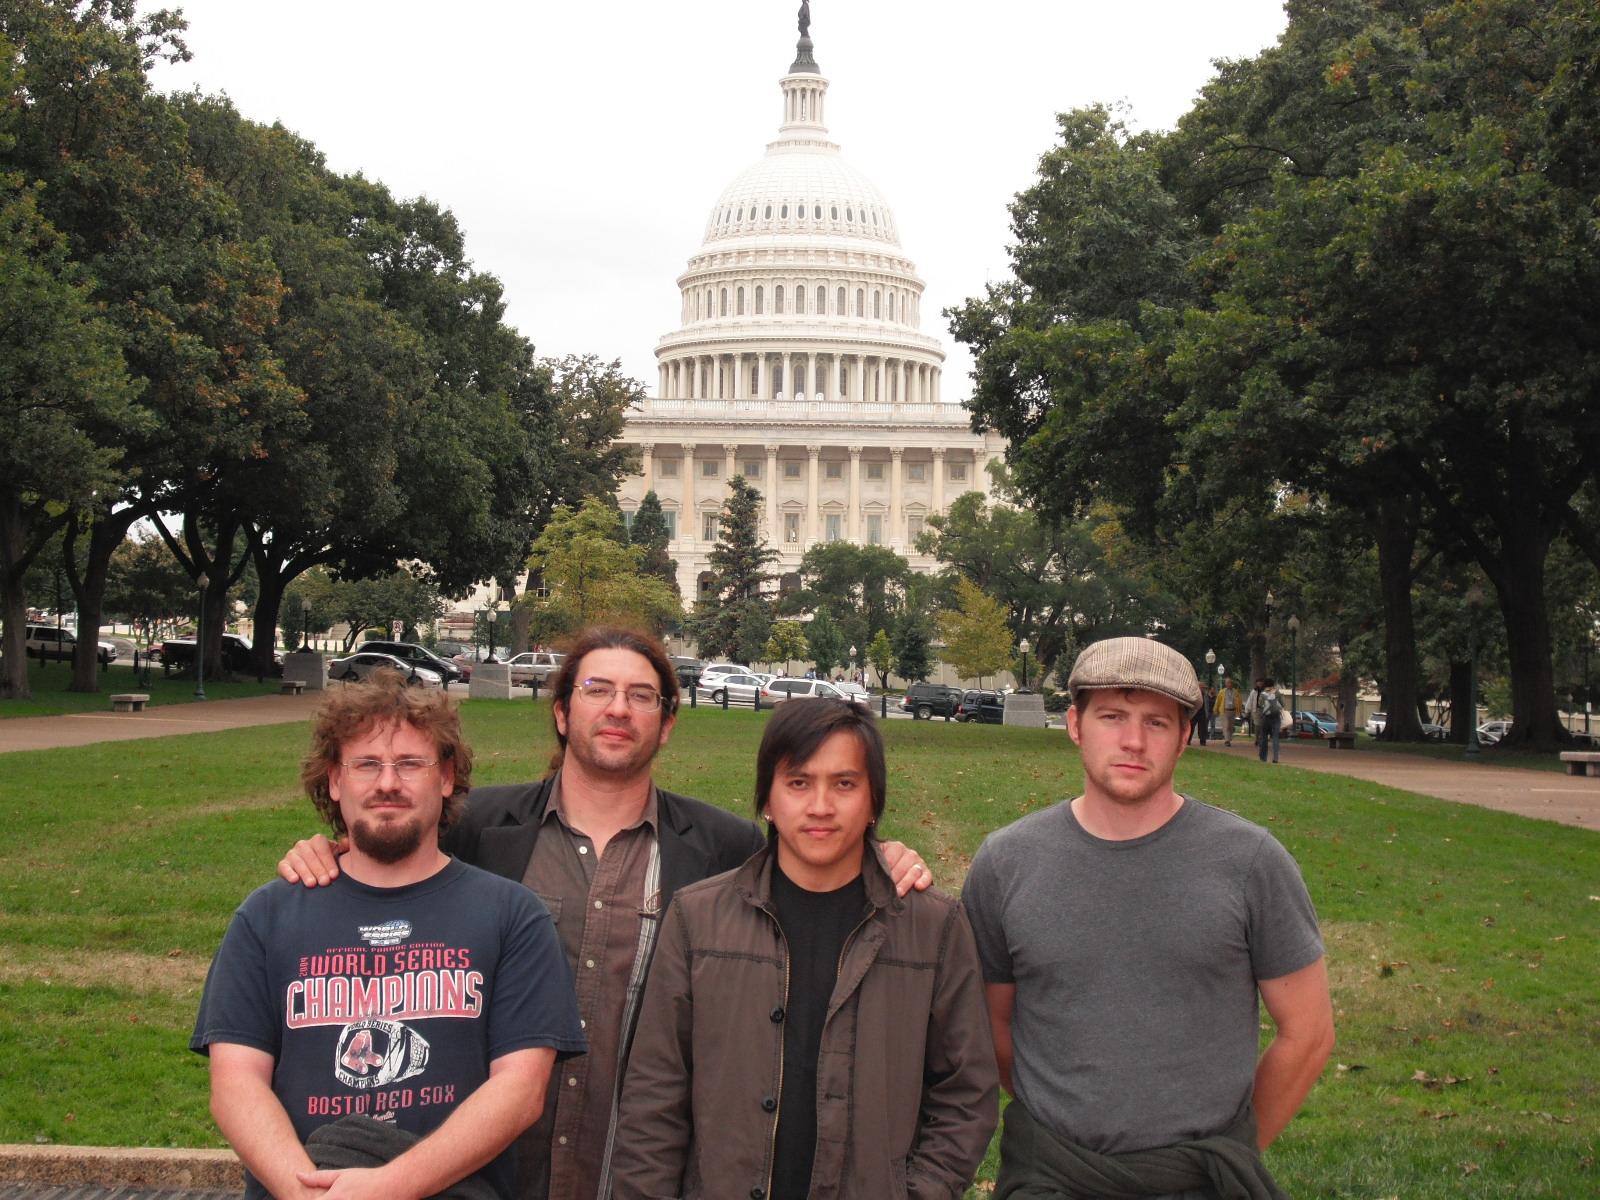 Capital Building, Washington D.C.  (10-2-09)  photo by Bill Nelson